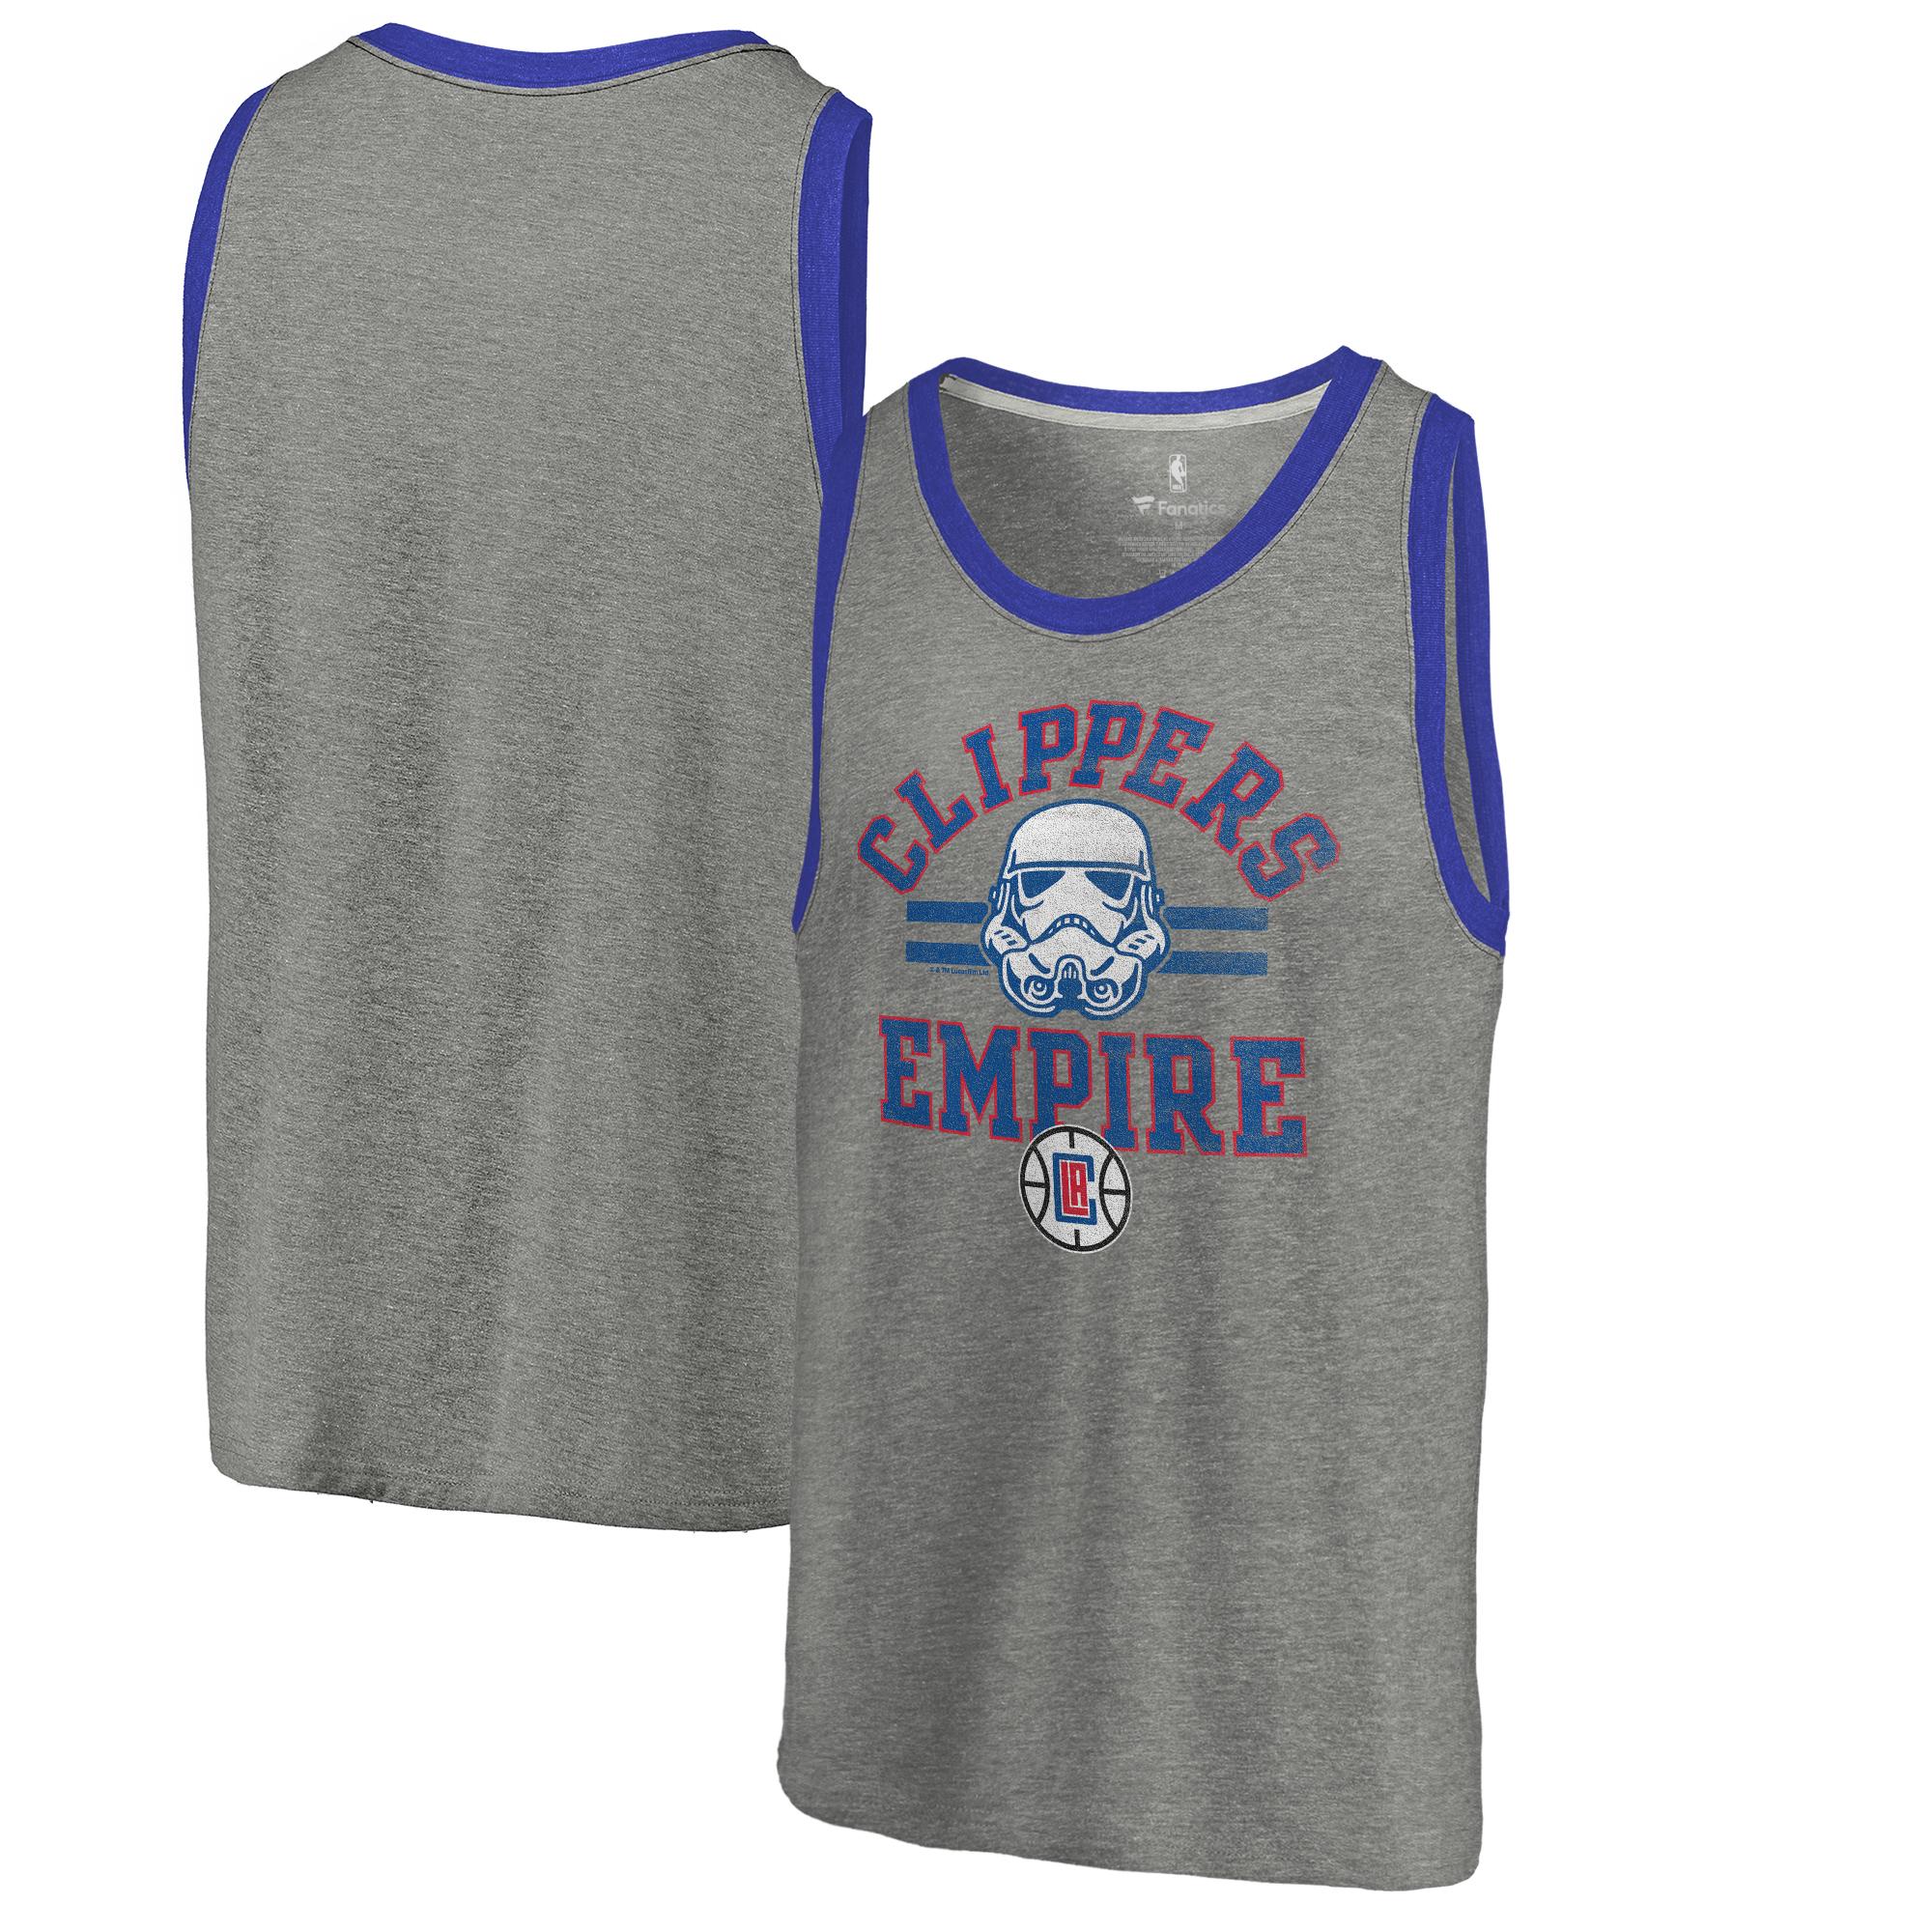 LA Clippers Fanatics Branded Star Wars Empire Tri-Blend Tank - Heathered Gray